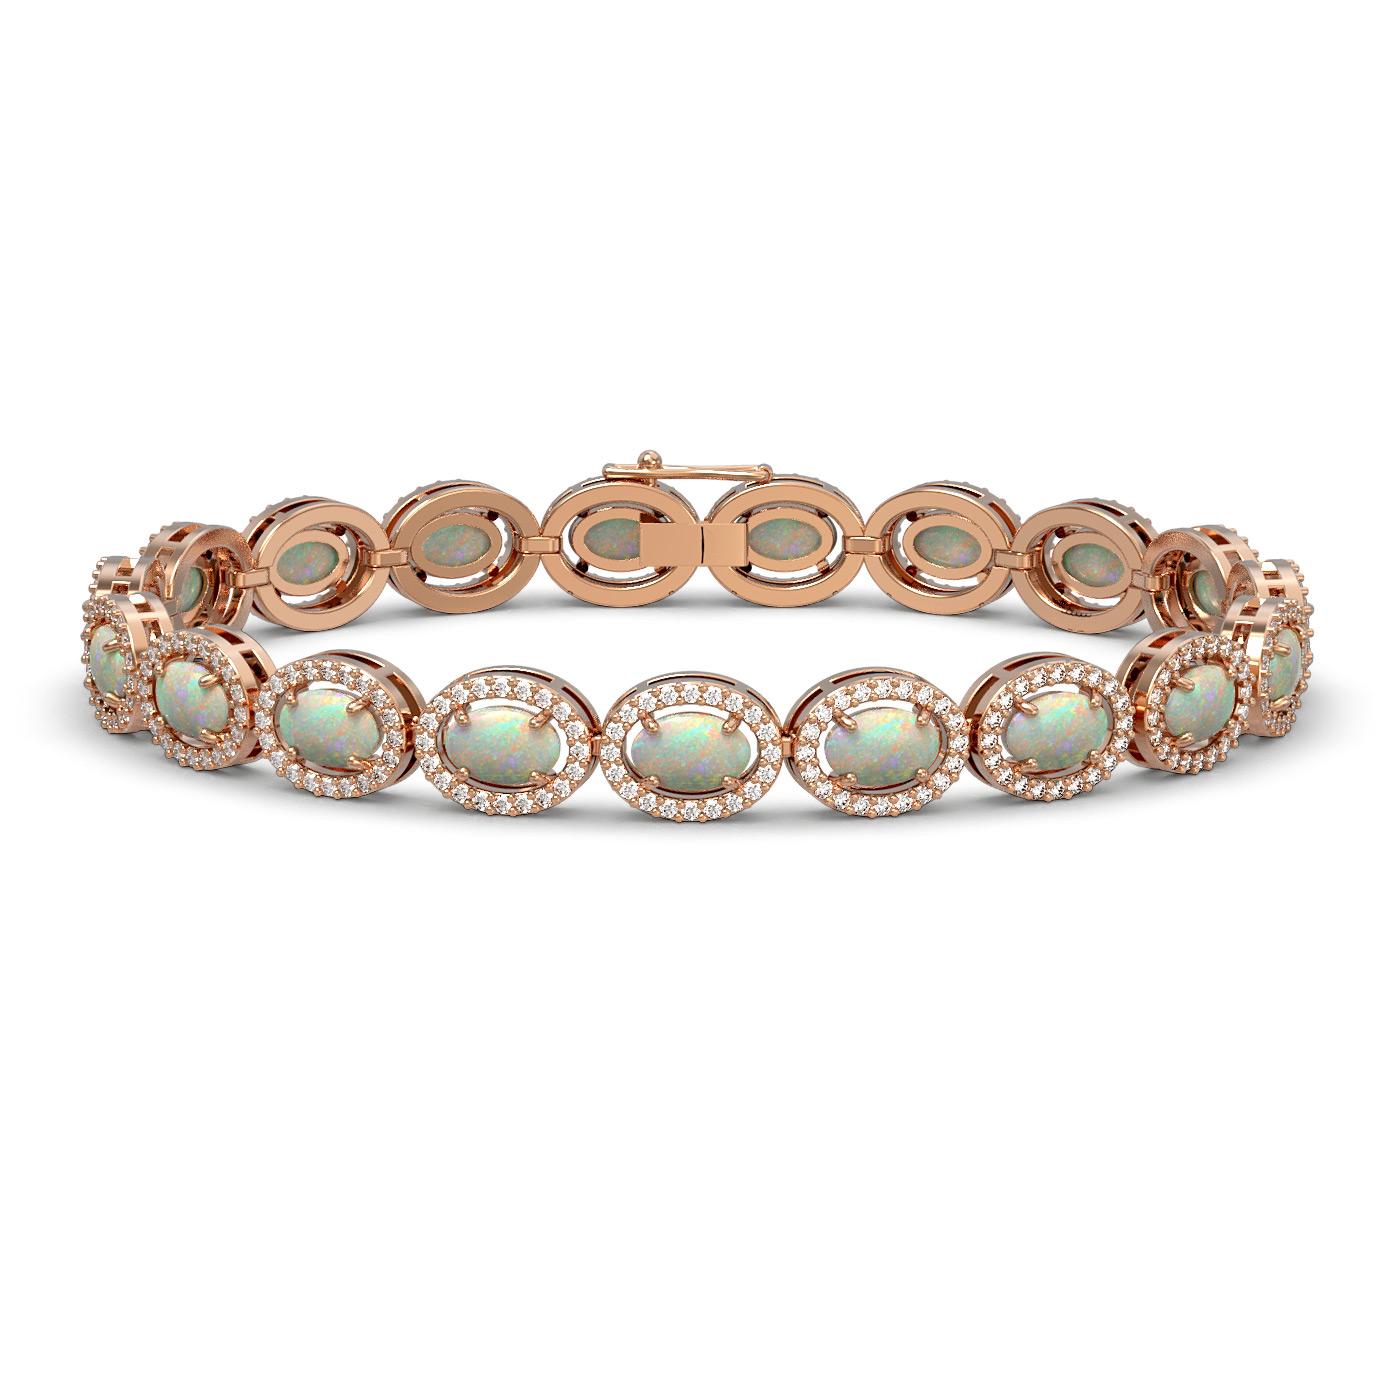 9.5 Ctw Opal & Diamond Bracelet Rose Gold